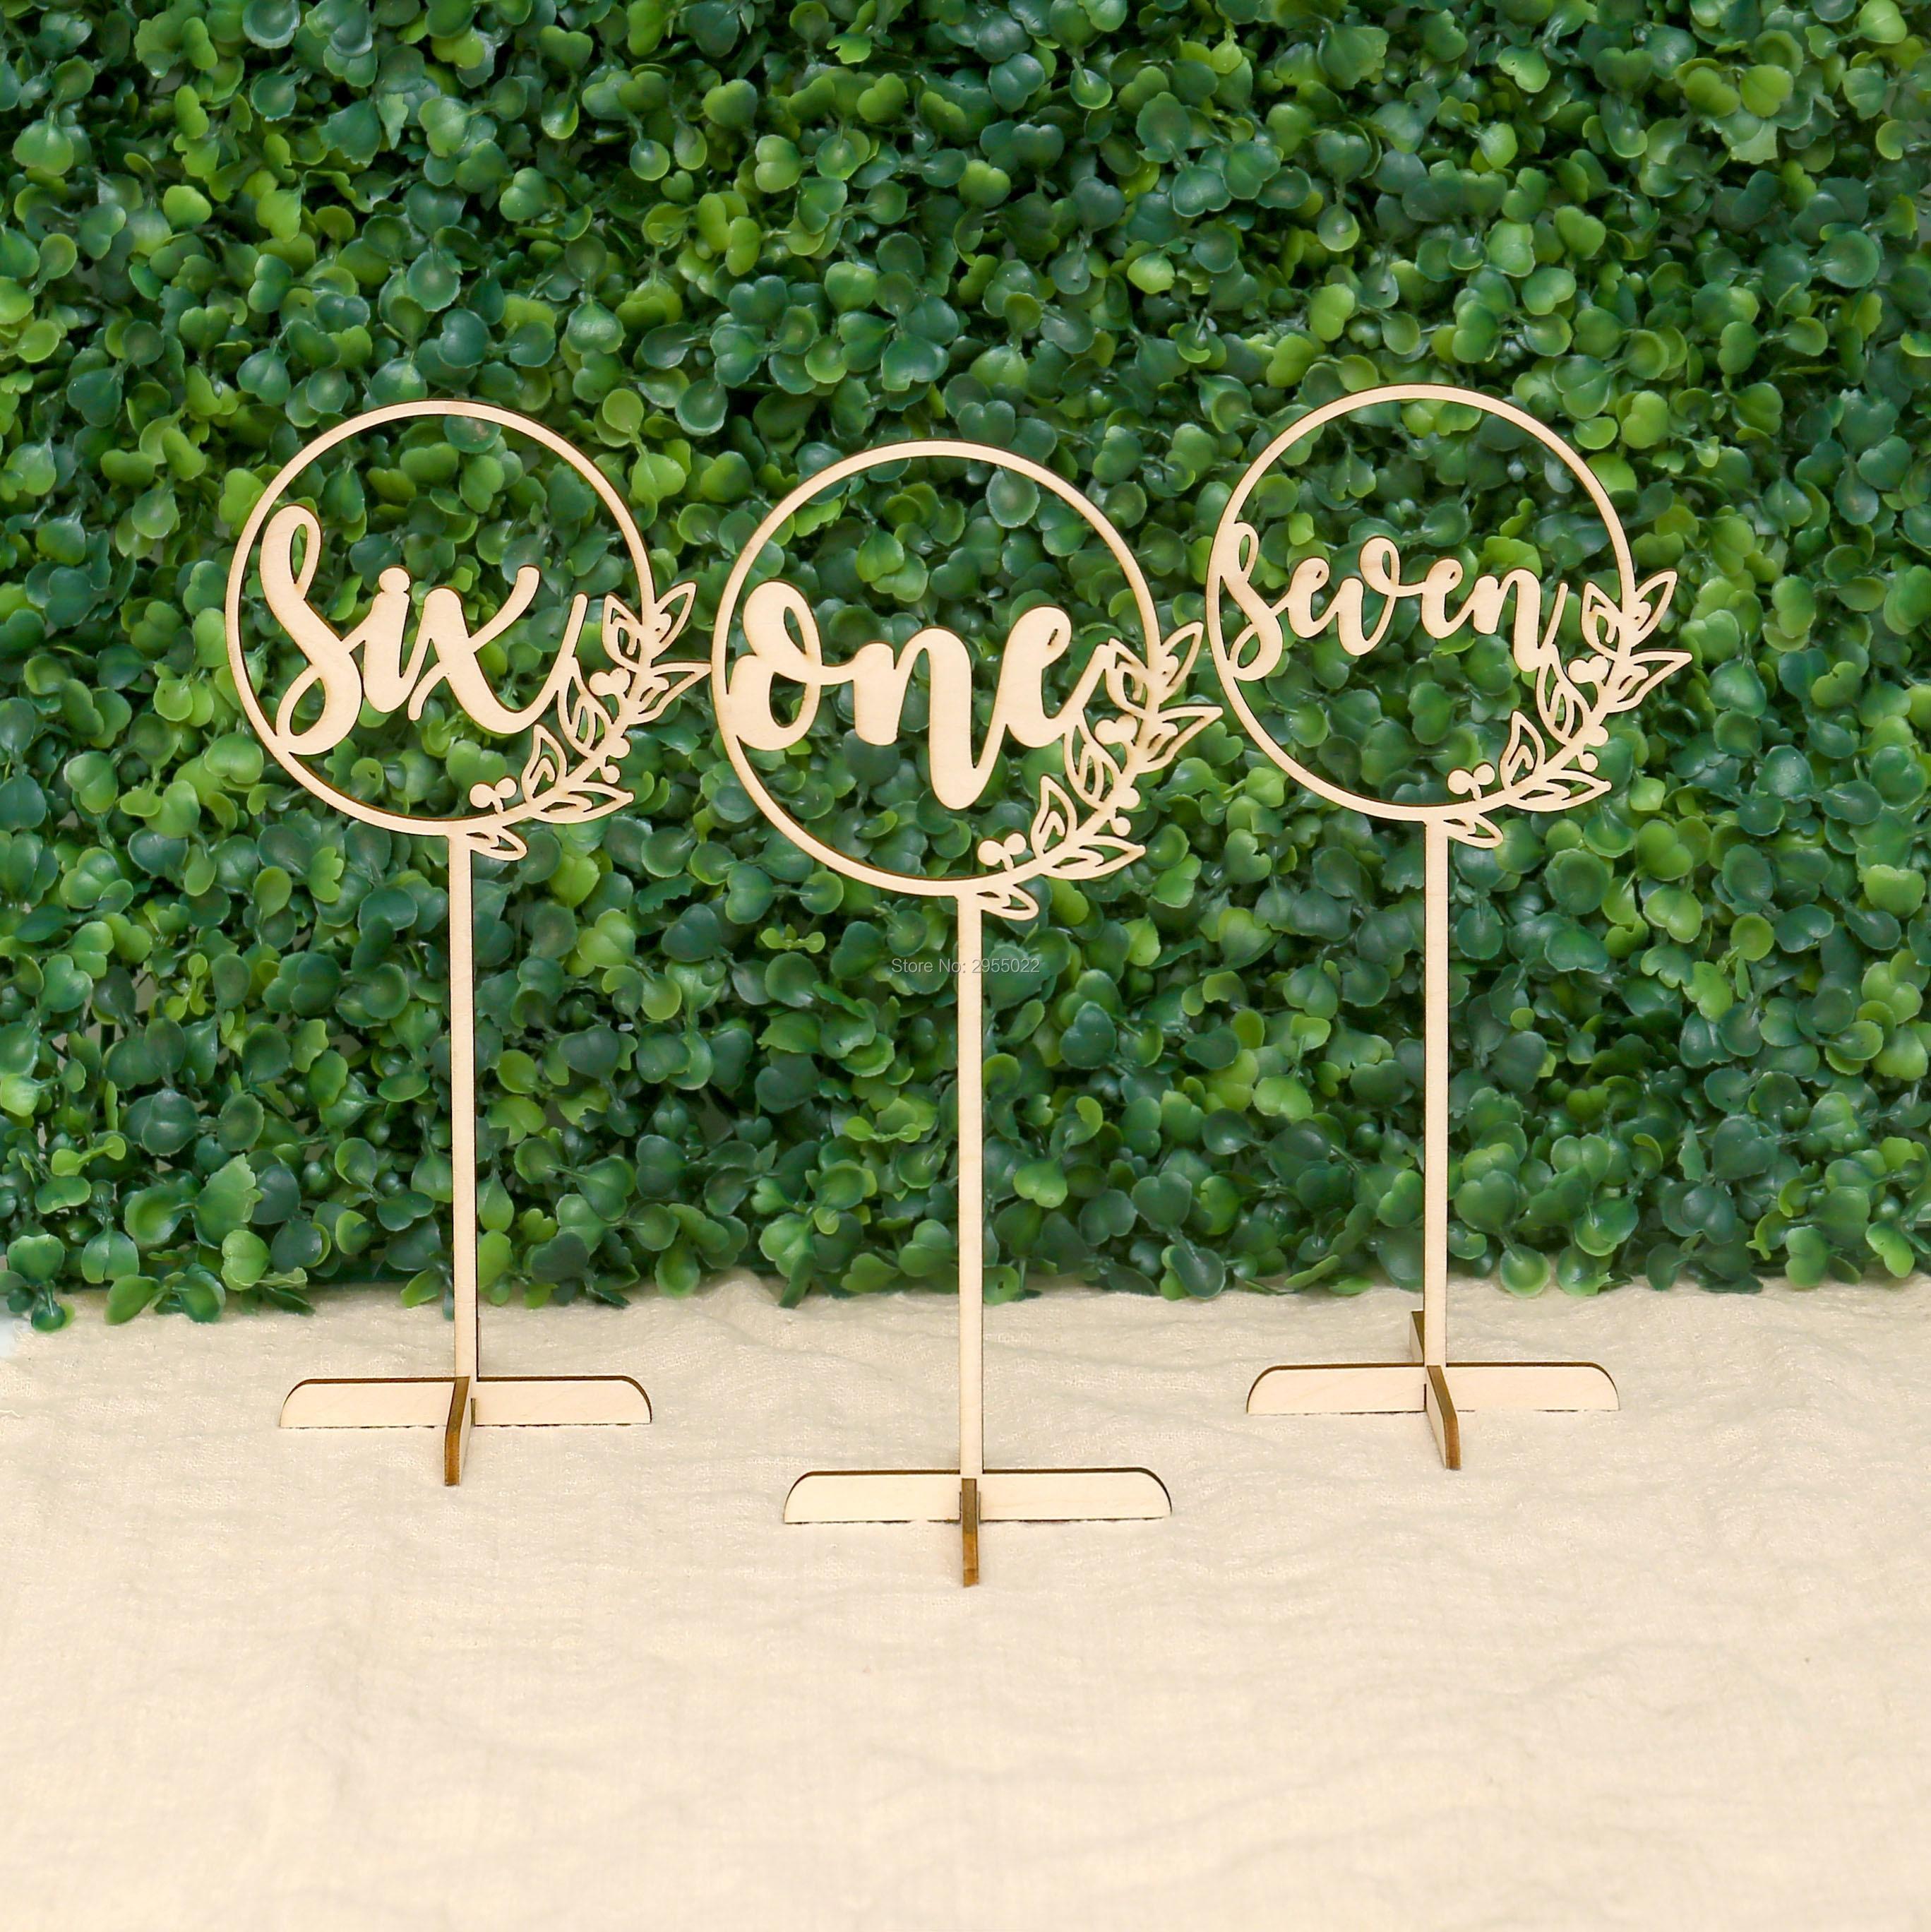 Mesa de madera elegante única rústica números de vid, centro de mesa de flores para boda, decoración de boda, PEANDIM candelabros centros de mesa para bodas mesa de centro candelabros partes decoración K9 candelabro de cristal de oro de vela